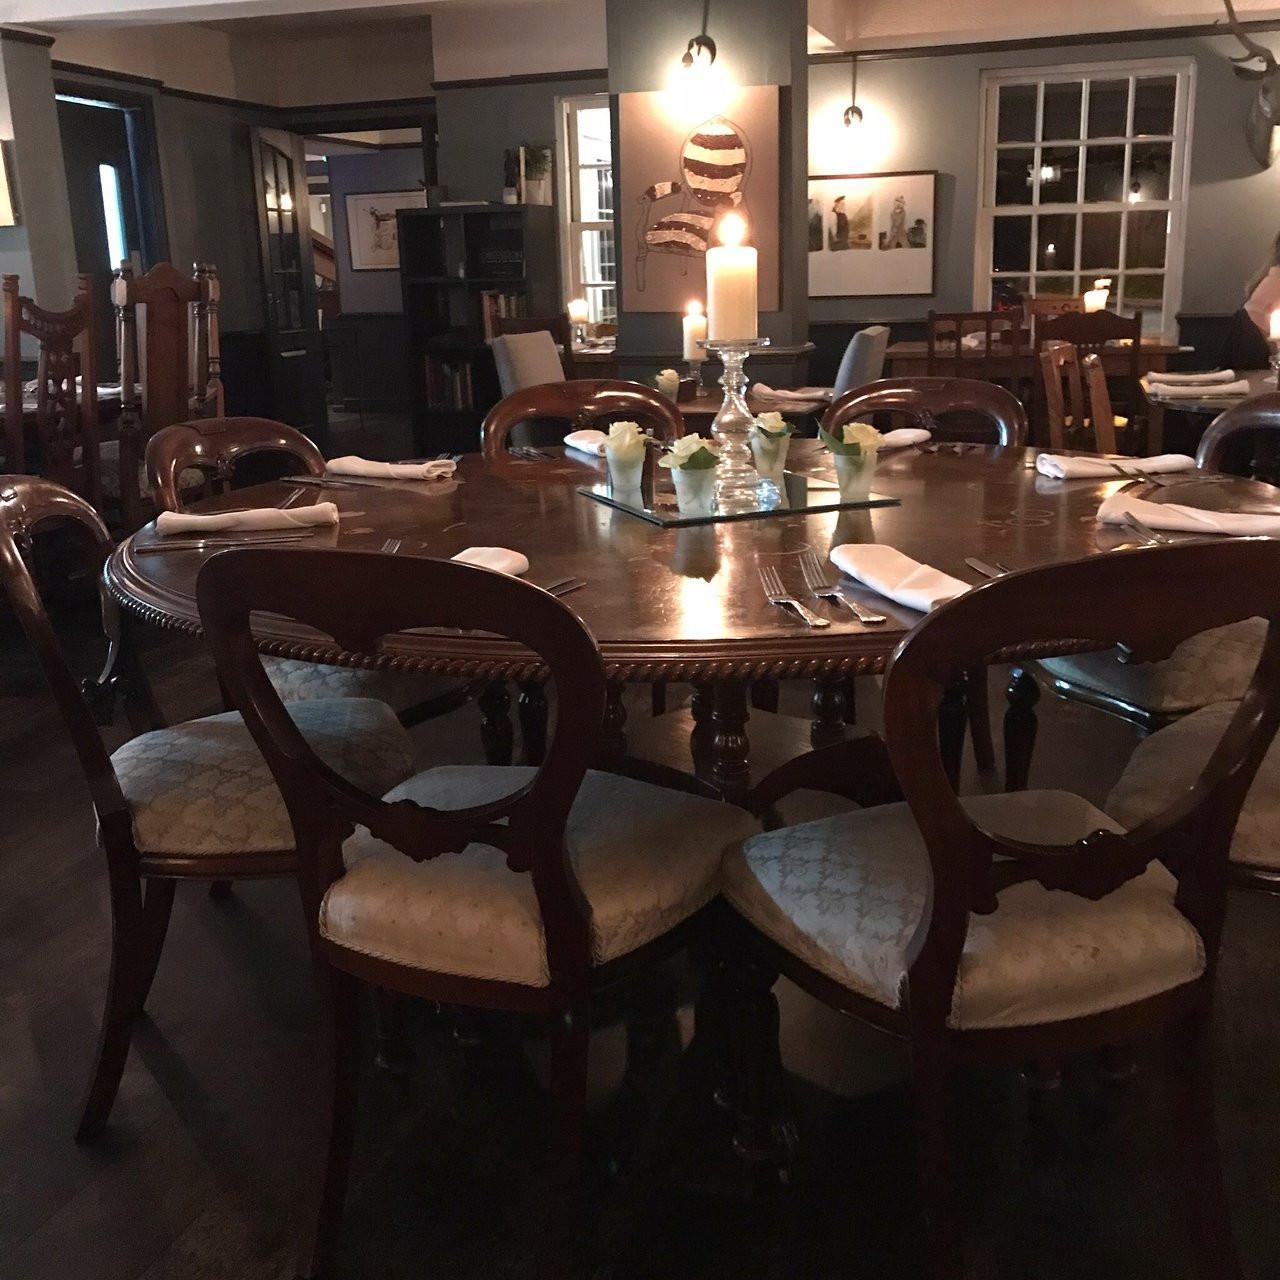 dj hardwood floors llc of the plough inn 2018 prices reviews photos congleton tripadvisor for tables beautifully laid